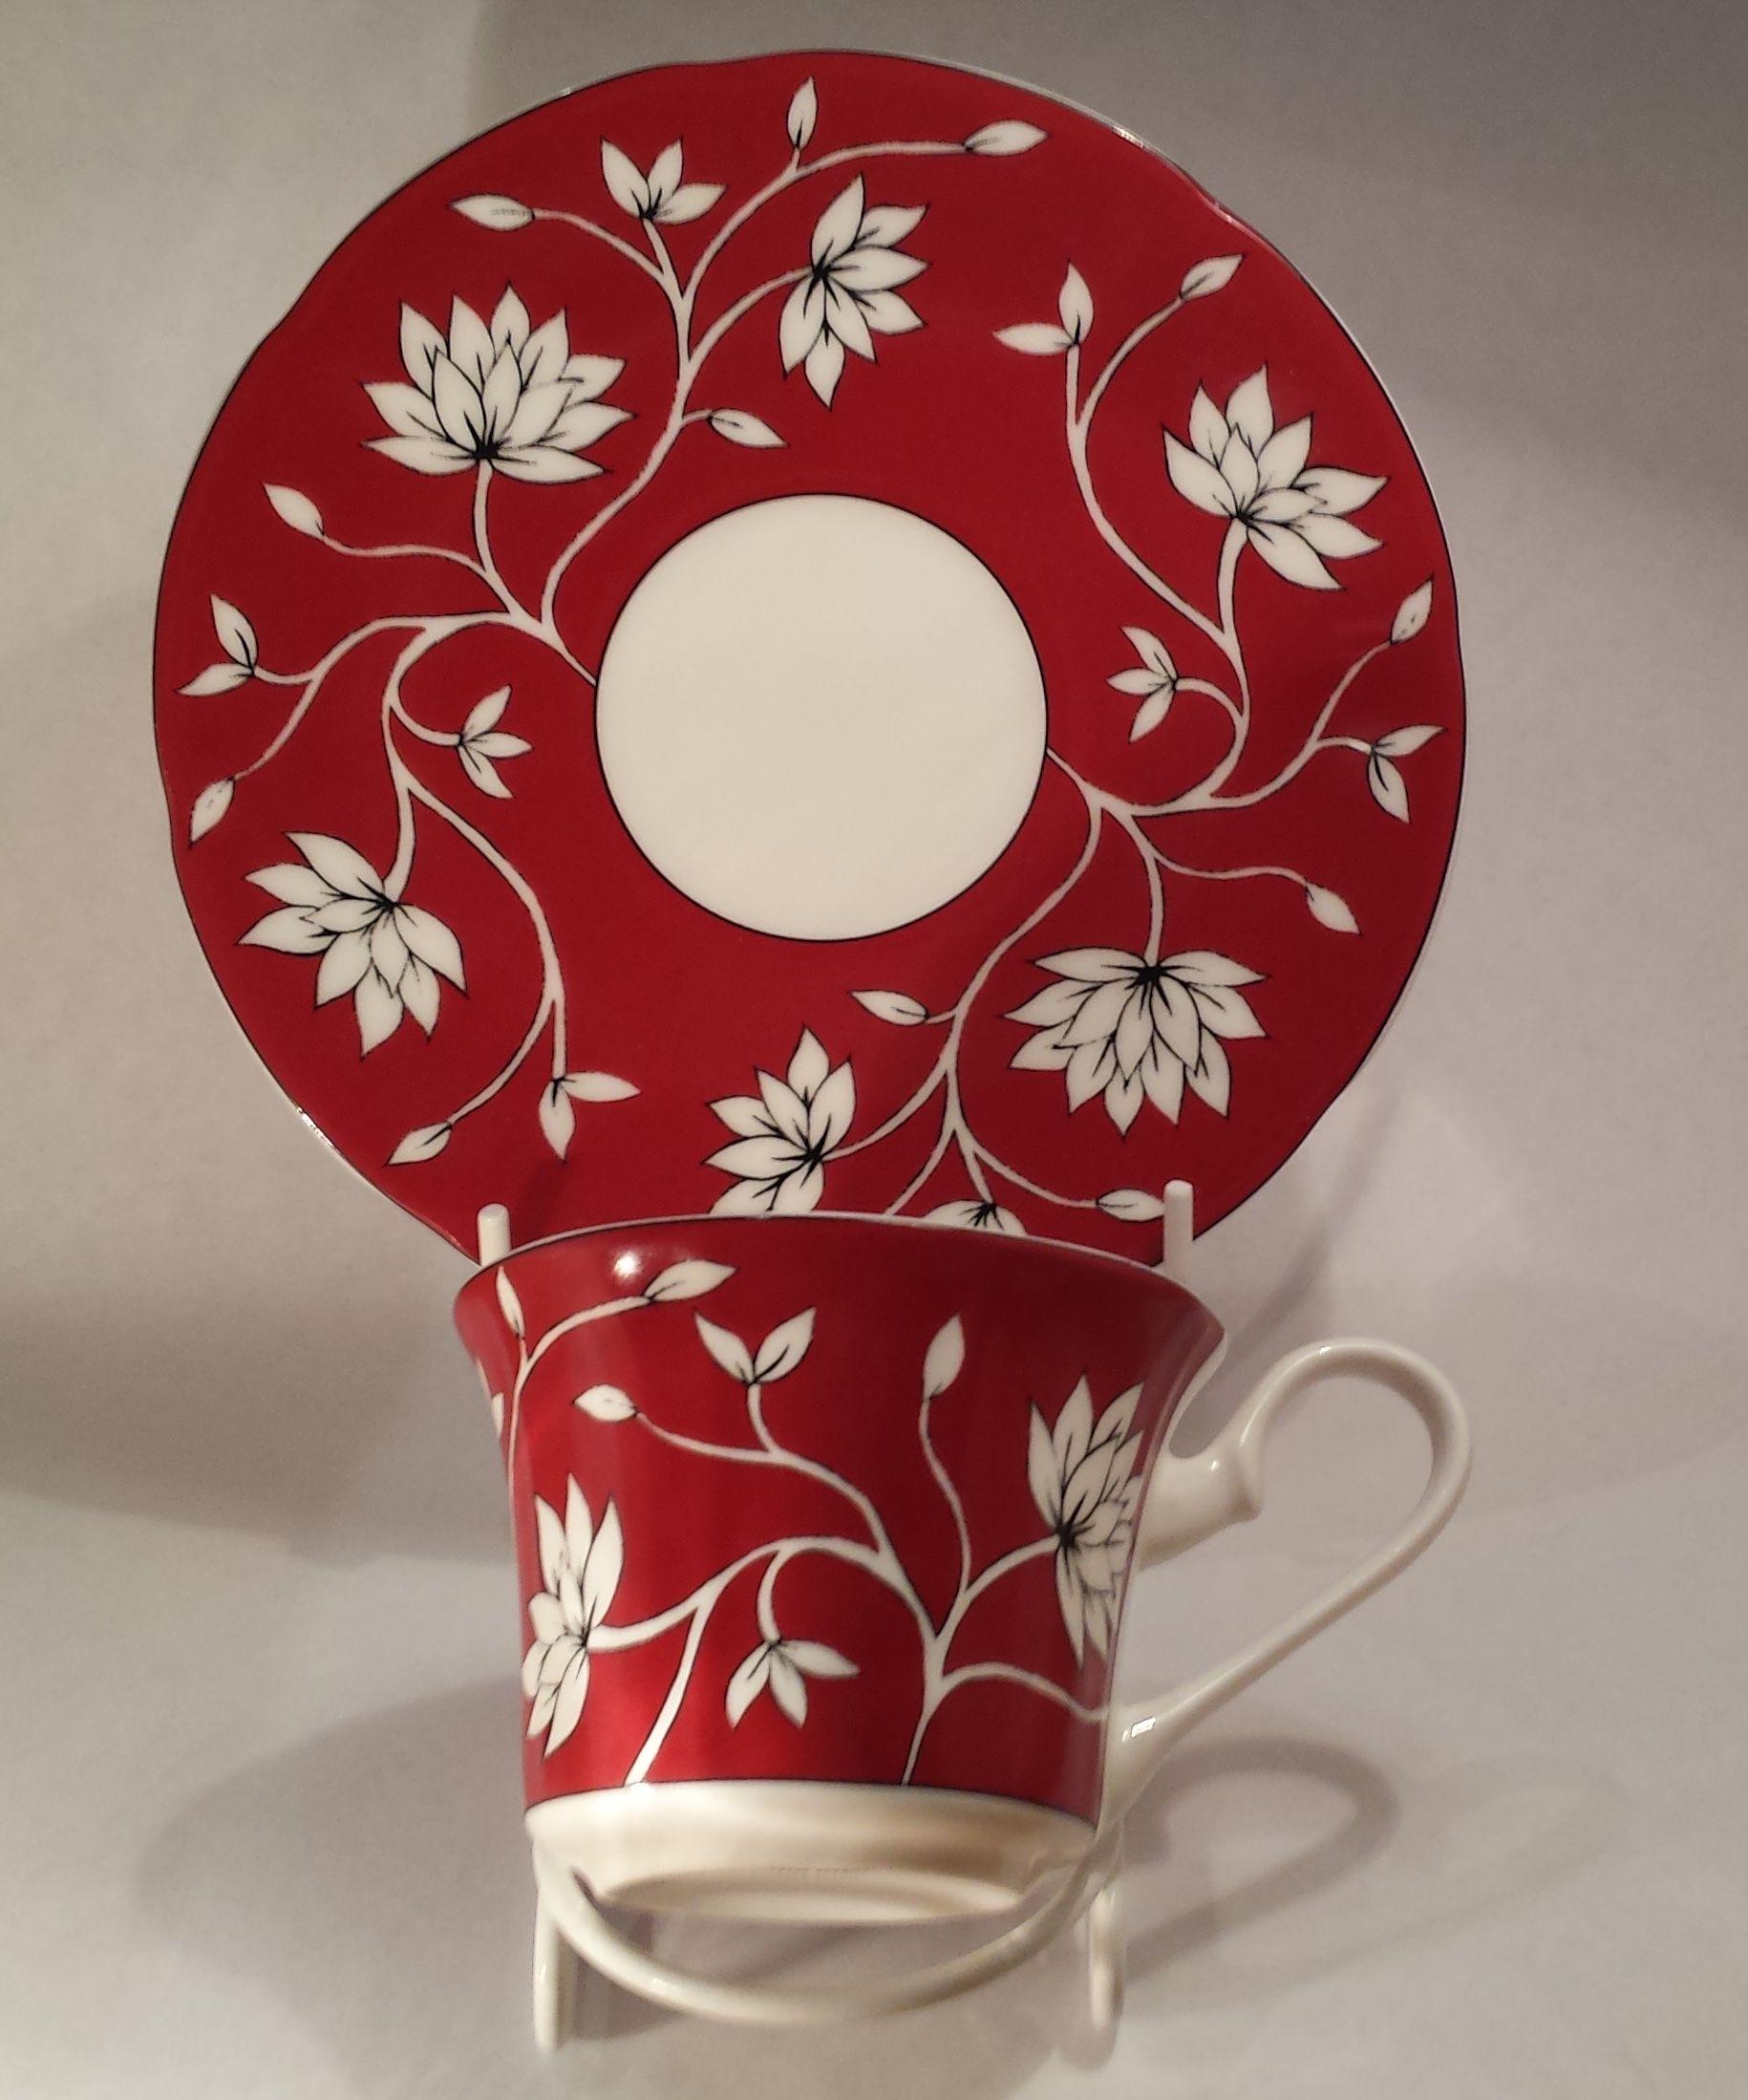 Crazy Tea harlequin set | Teas, Tea cup and Teacup